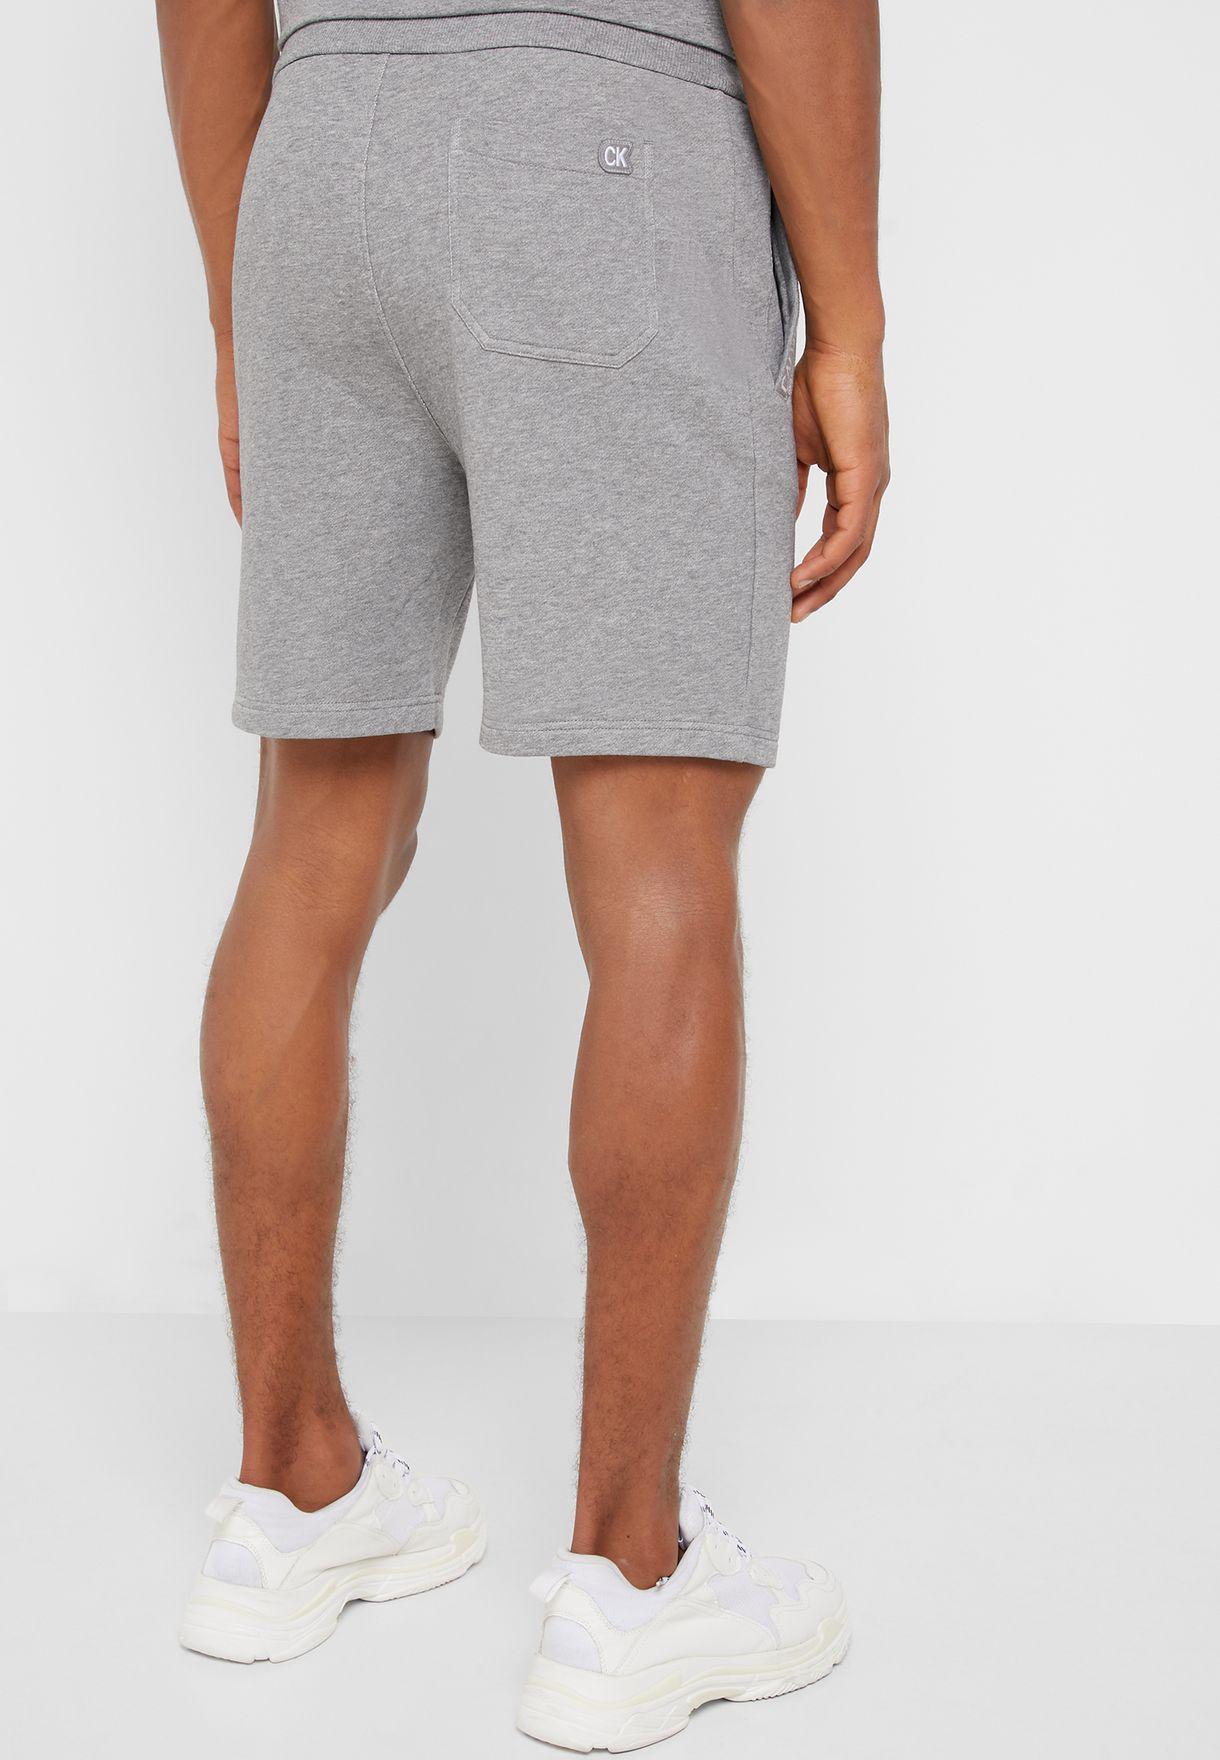 Institutional  Lounge Shorts